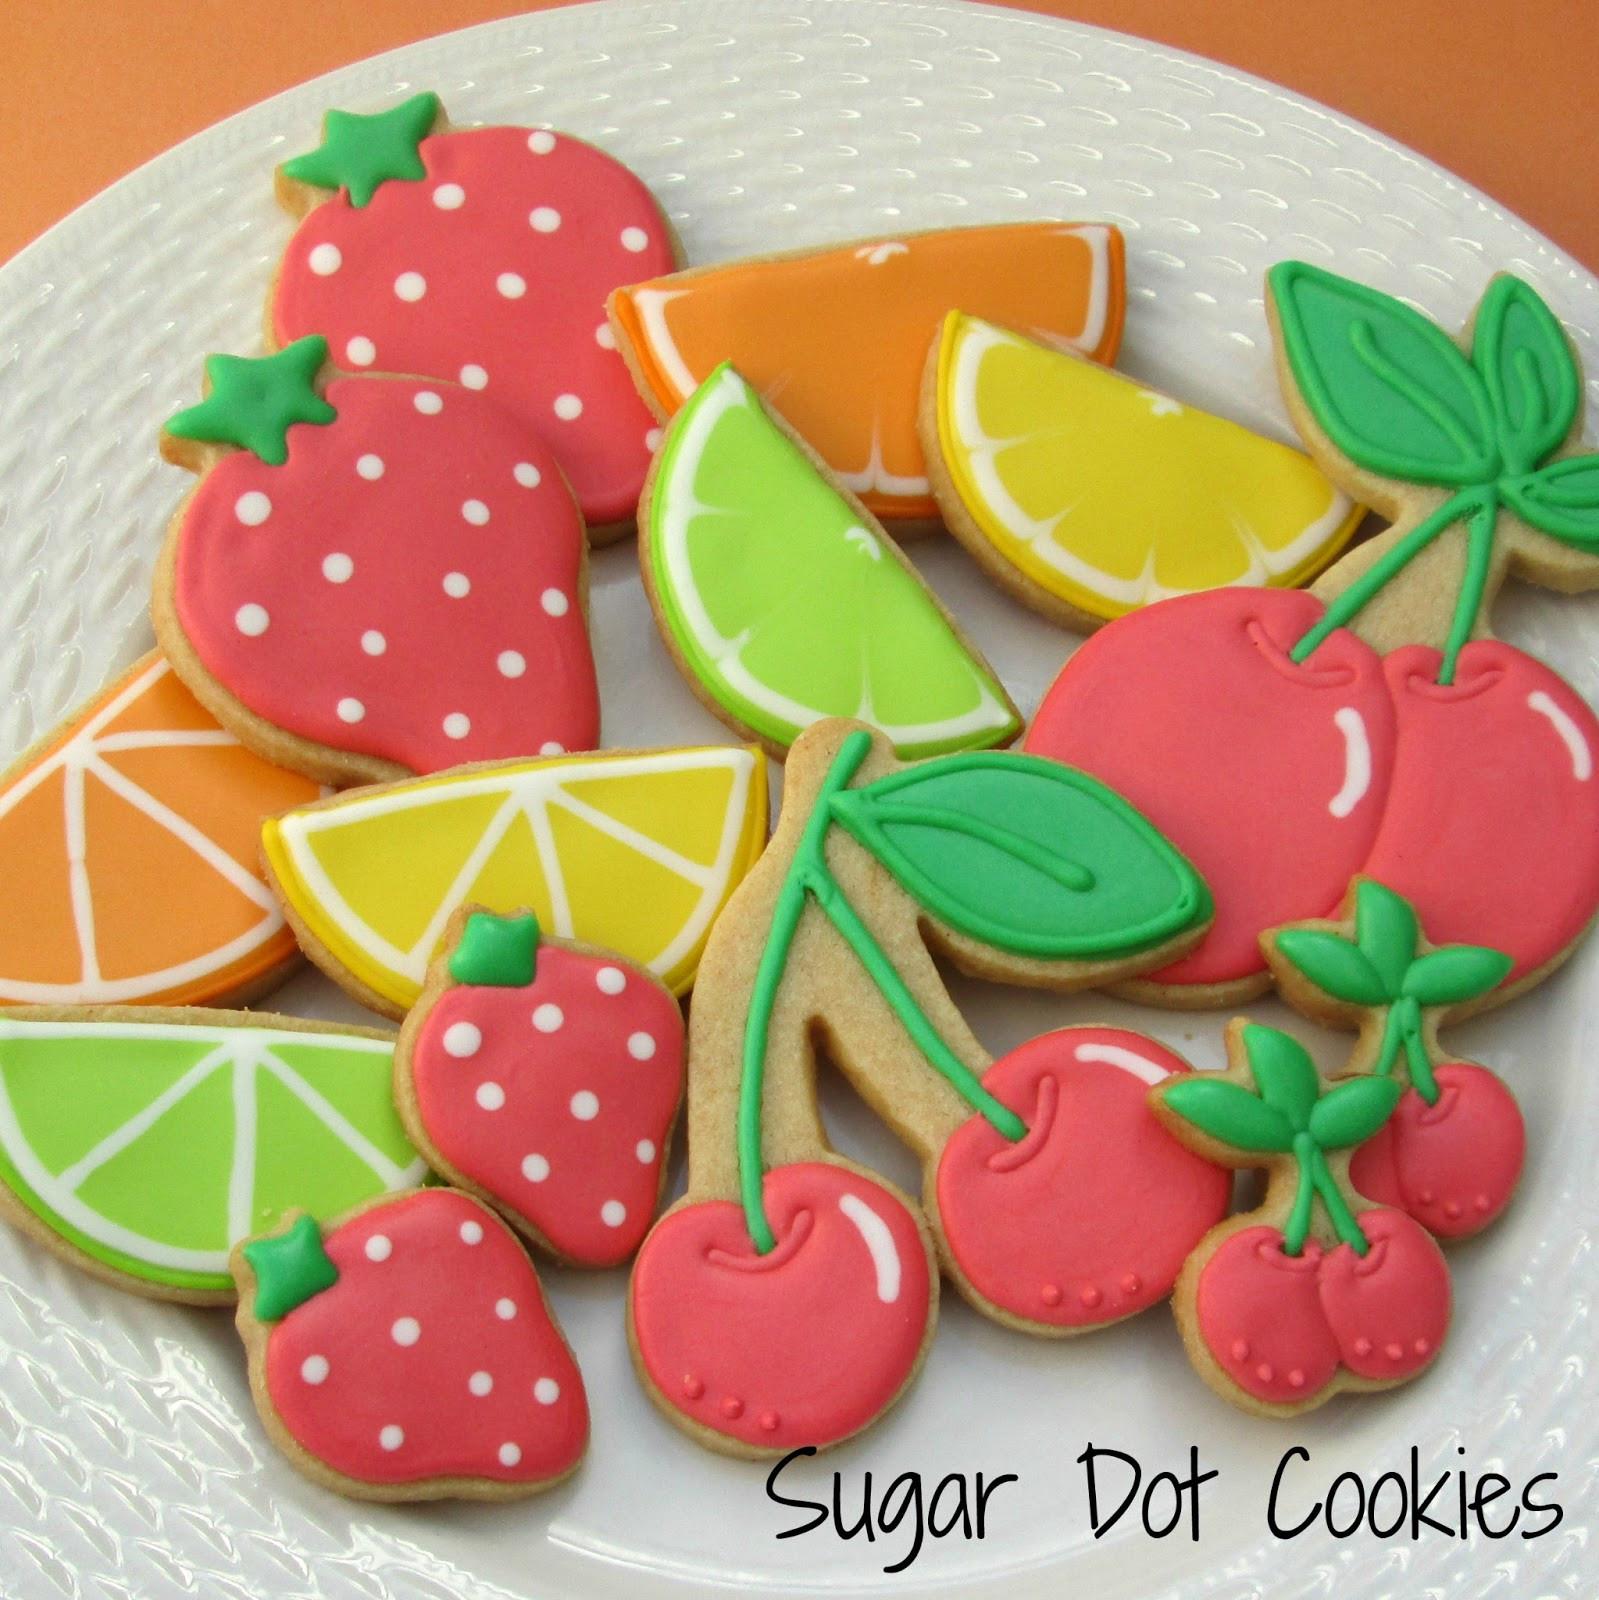 Royal Icing Recipe For Sugar Cookies  Friday April 19 2013